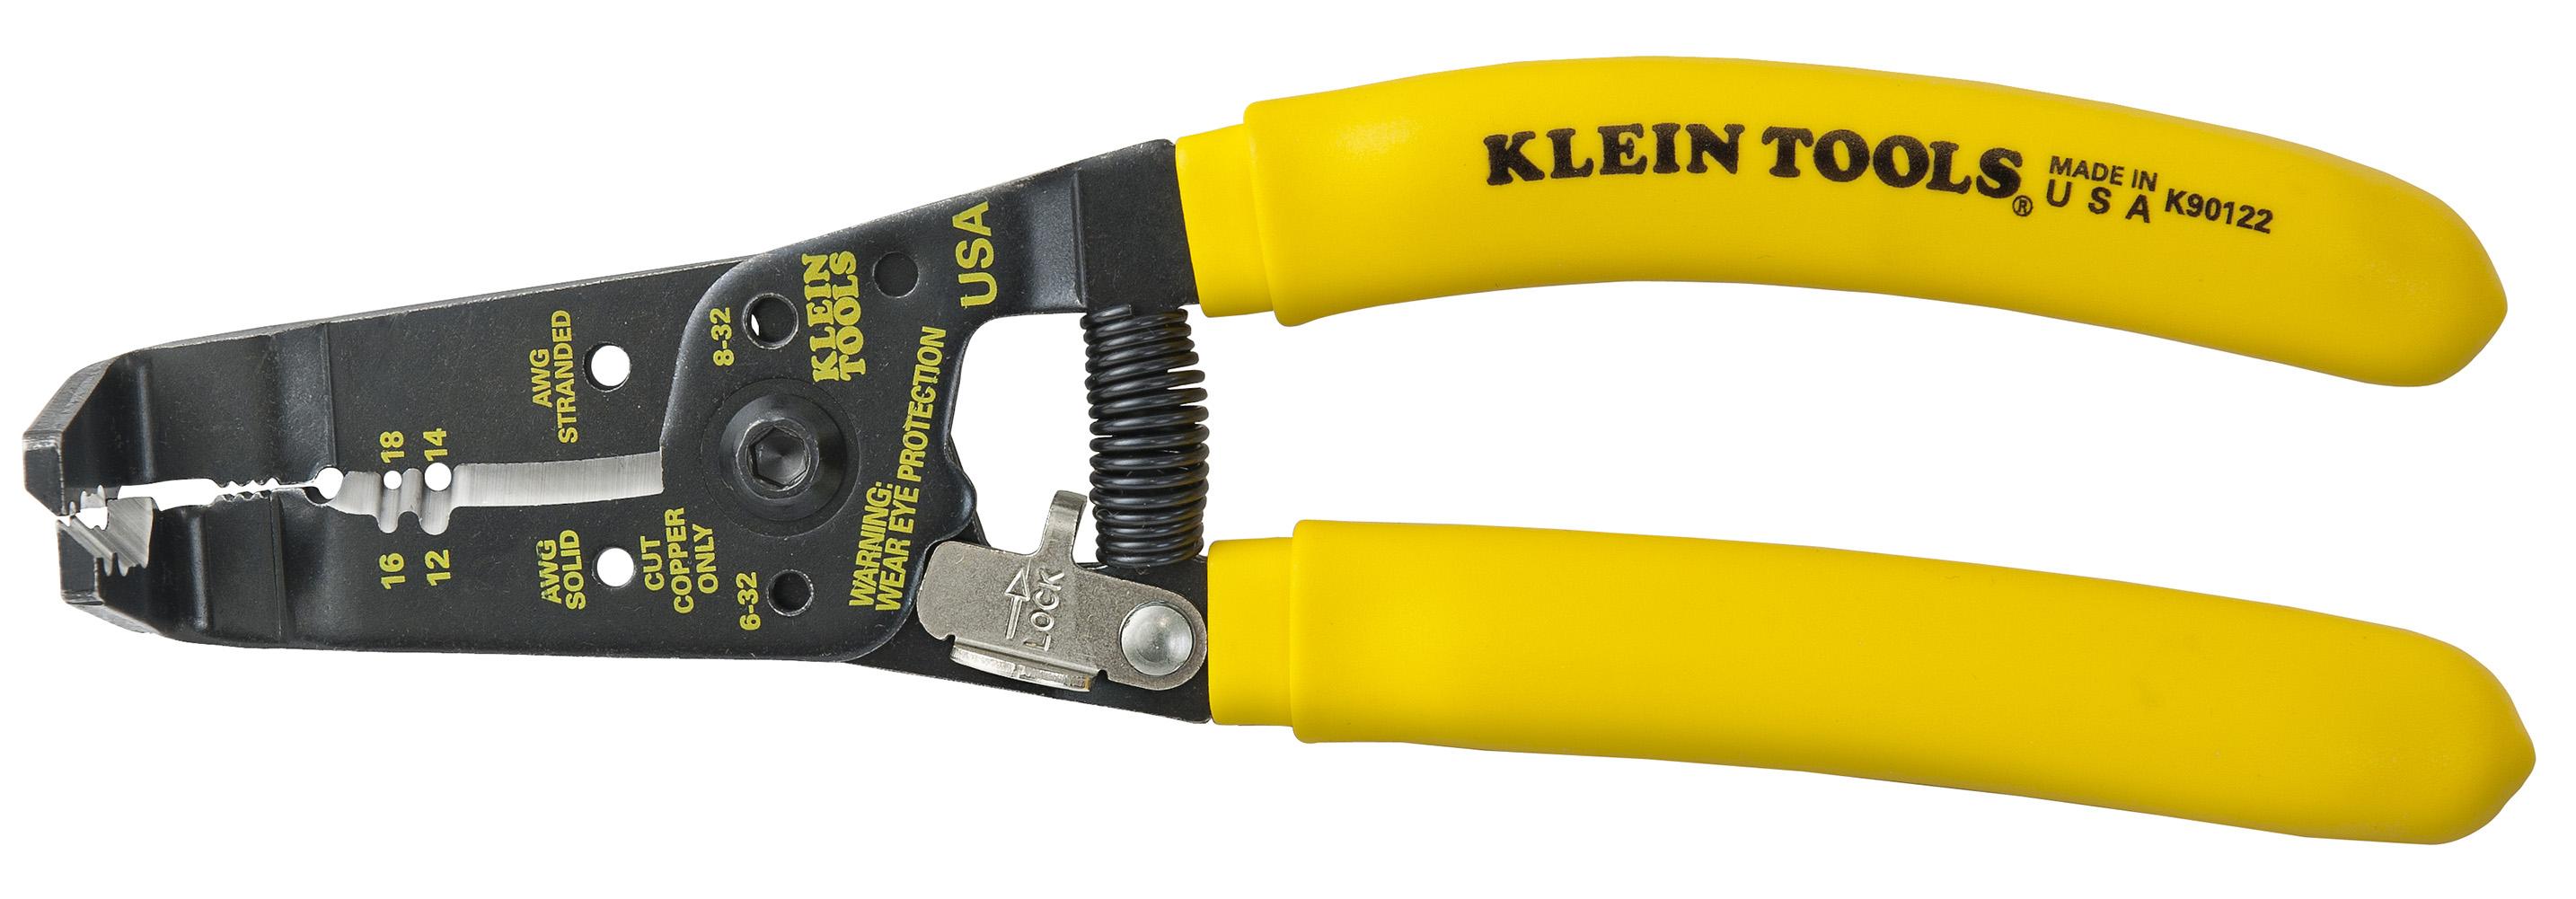 Klein K90 12 2 90 Degree Romex Stripper For 12 2 Nmb